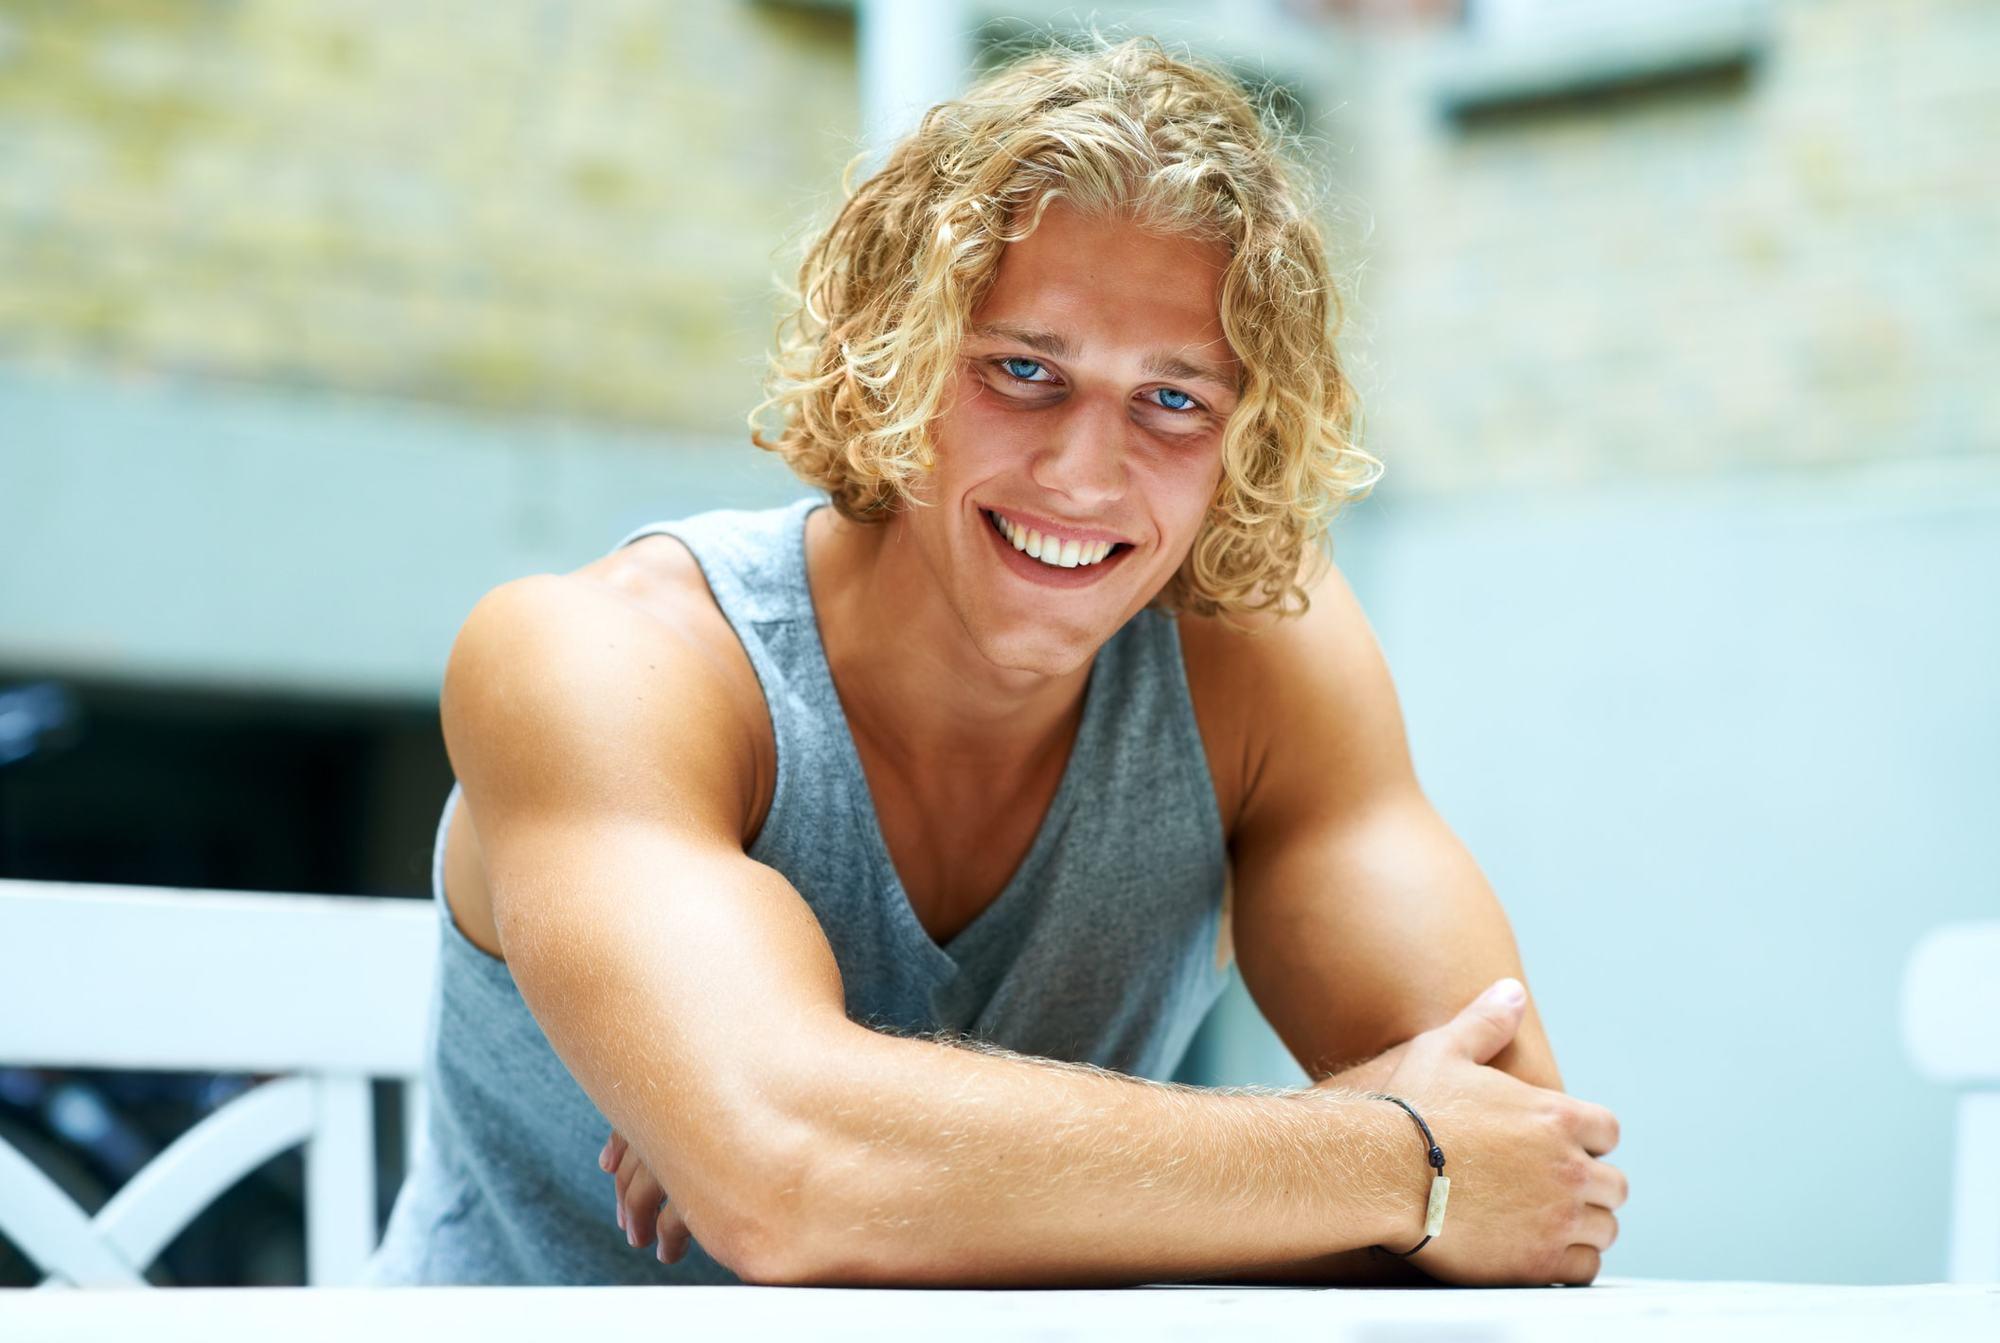 Homme avec homme blond javellisant perm